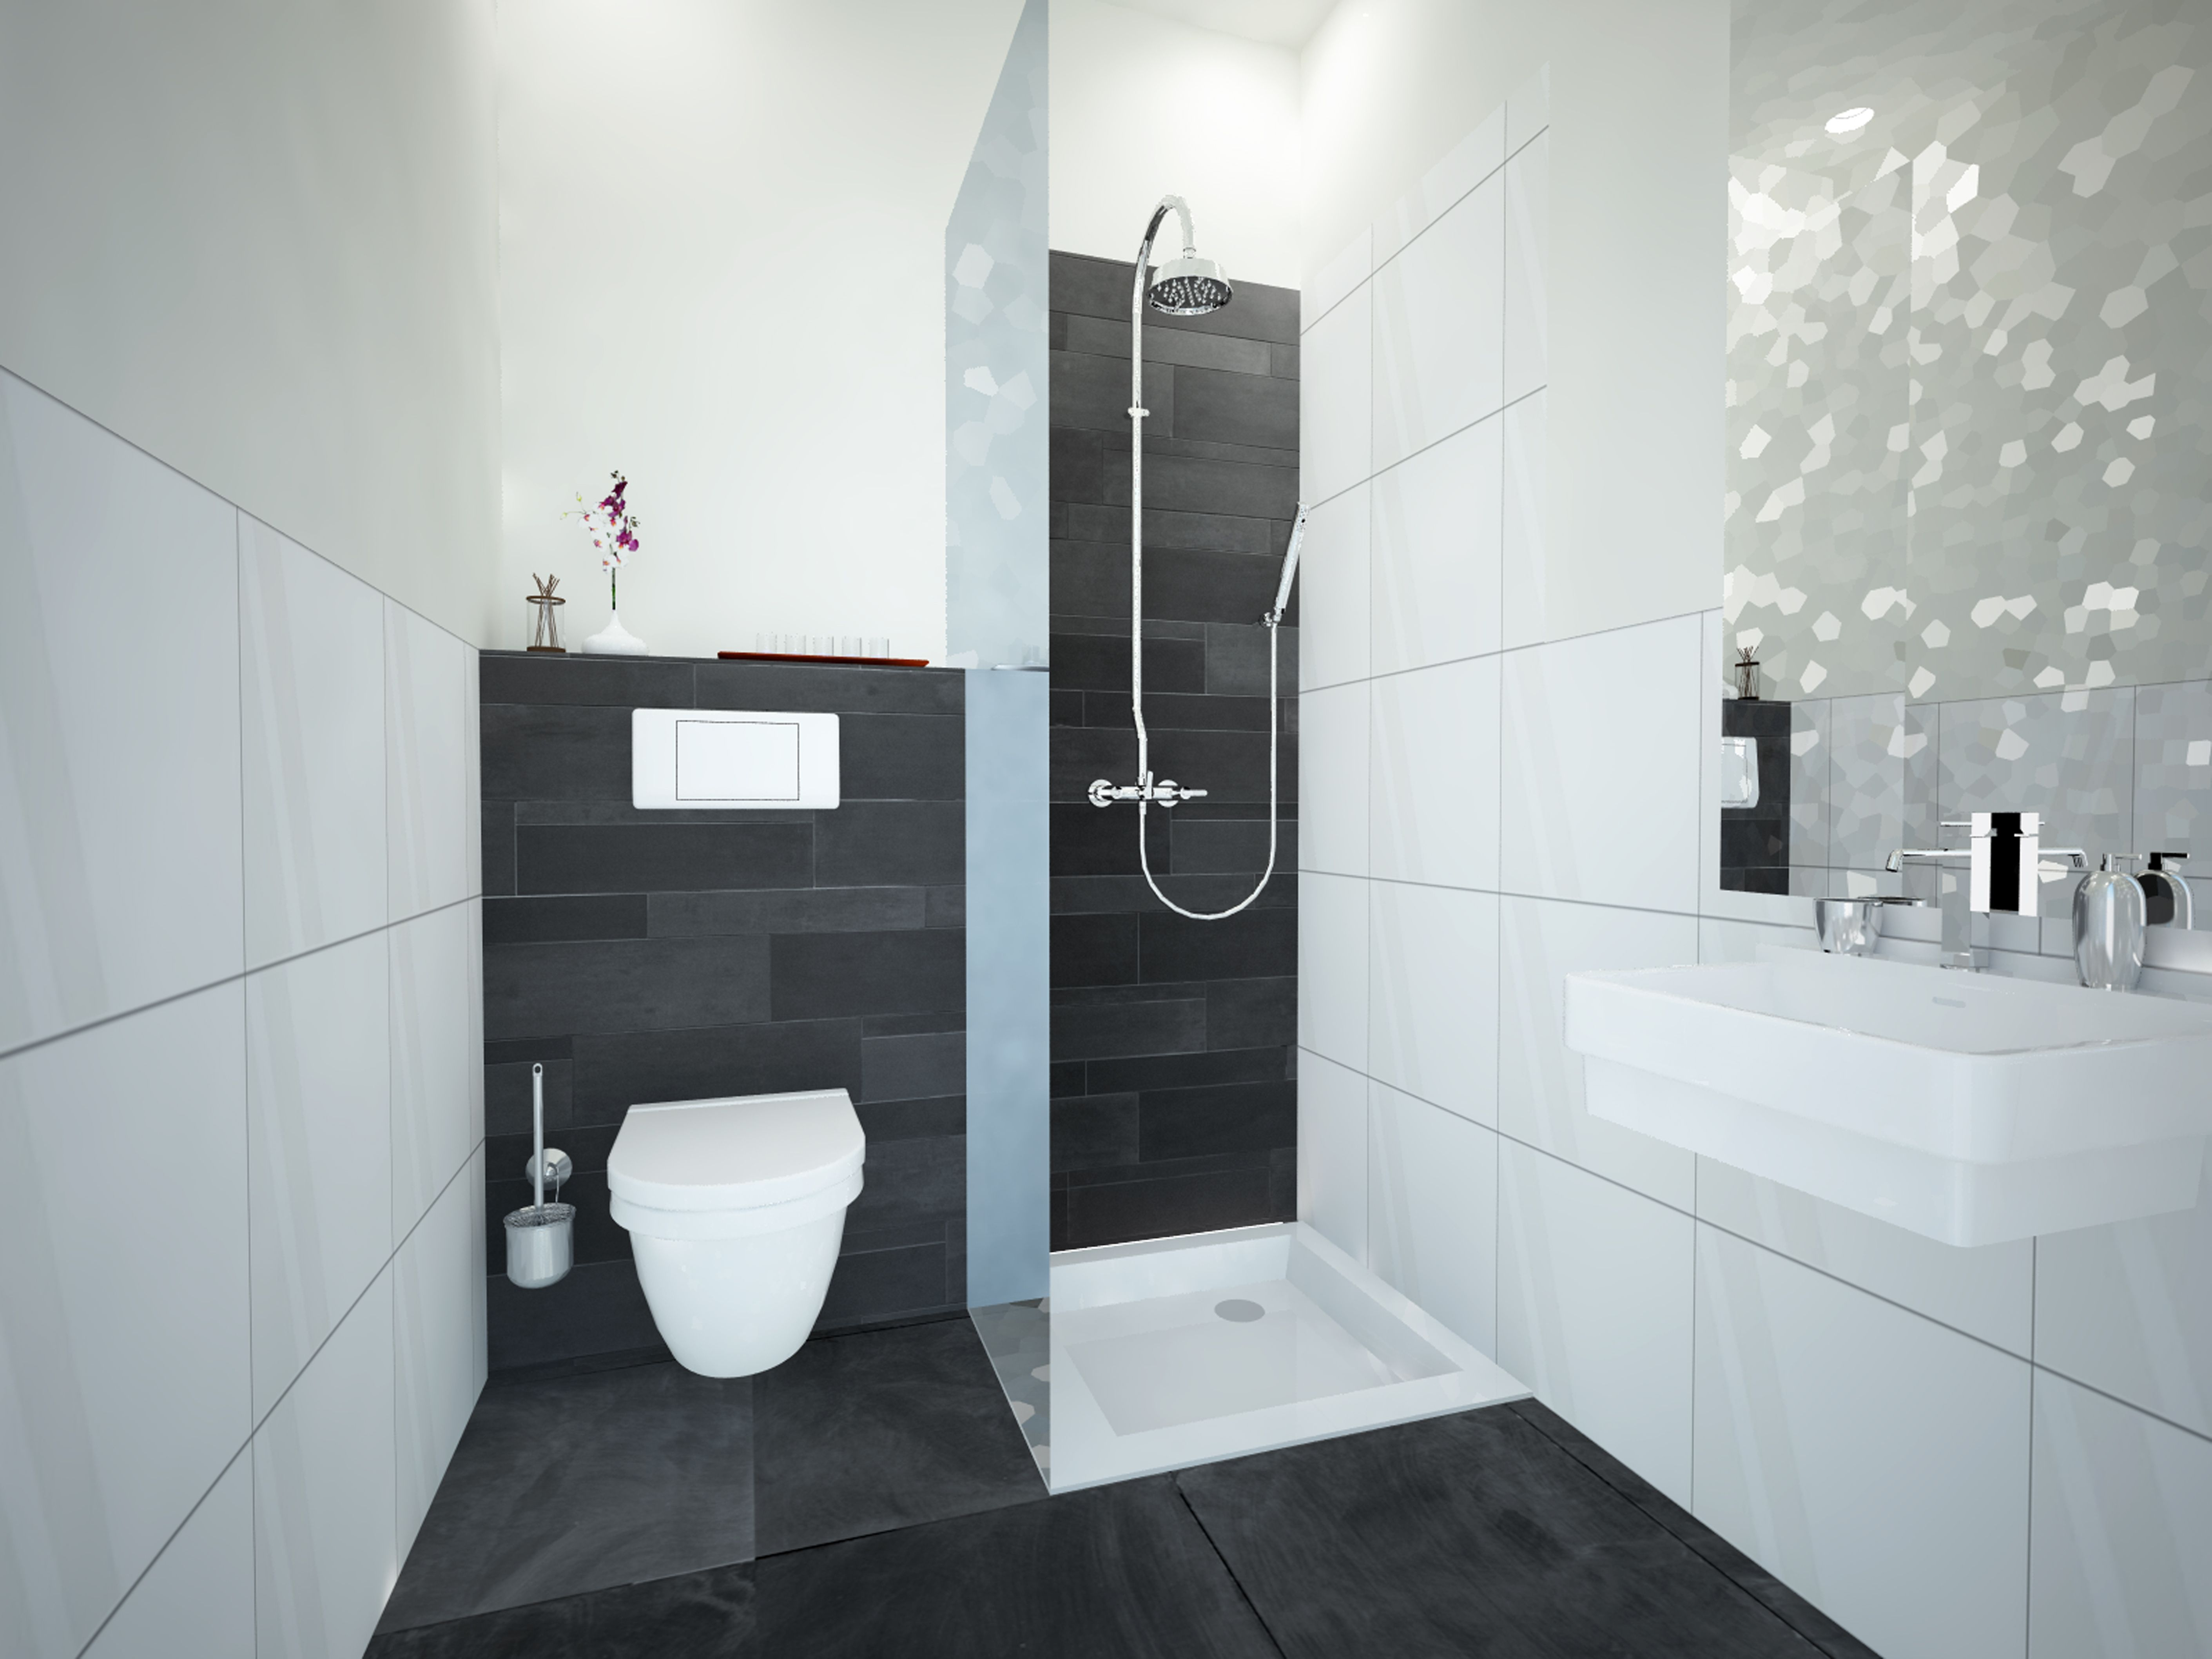 Badkamer zwart wit badkamers pinterest badkamer zwart badkamer en zoeken - Moderne design badkamer ...